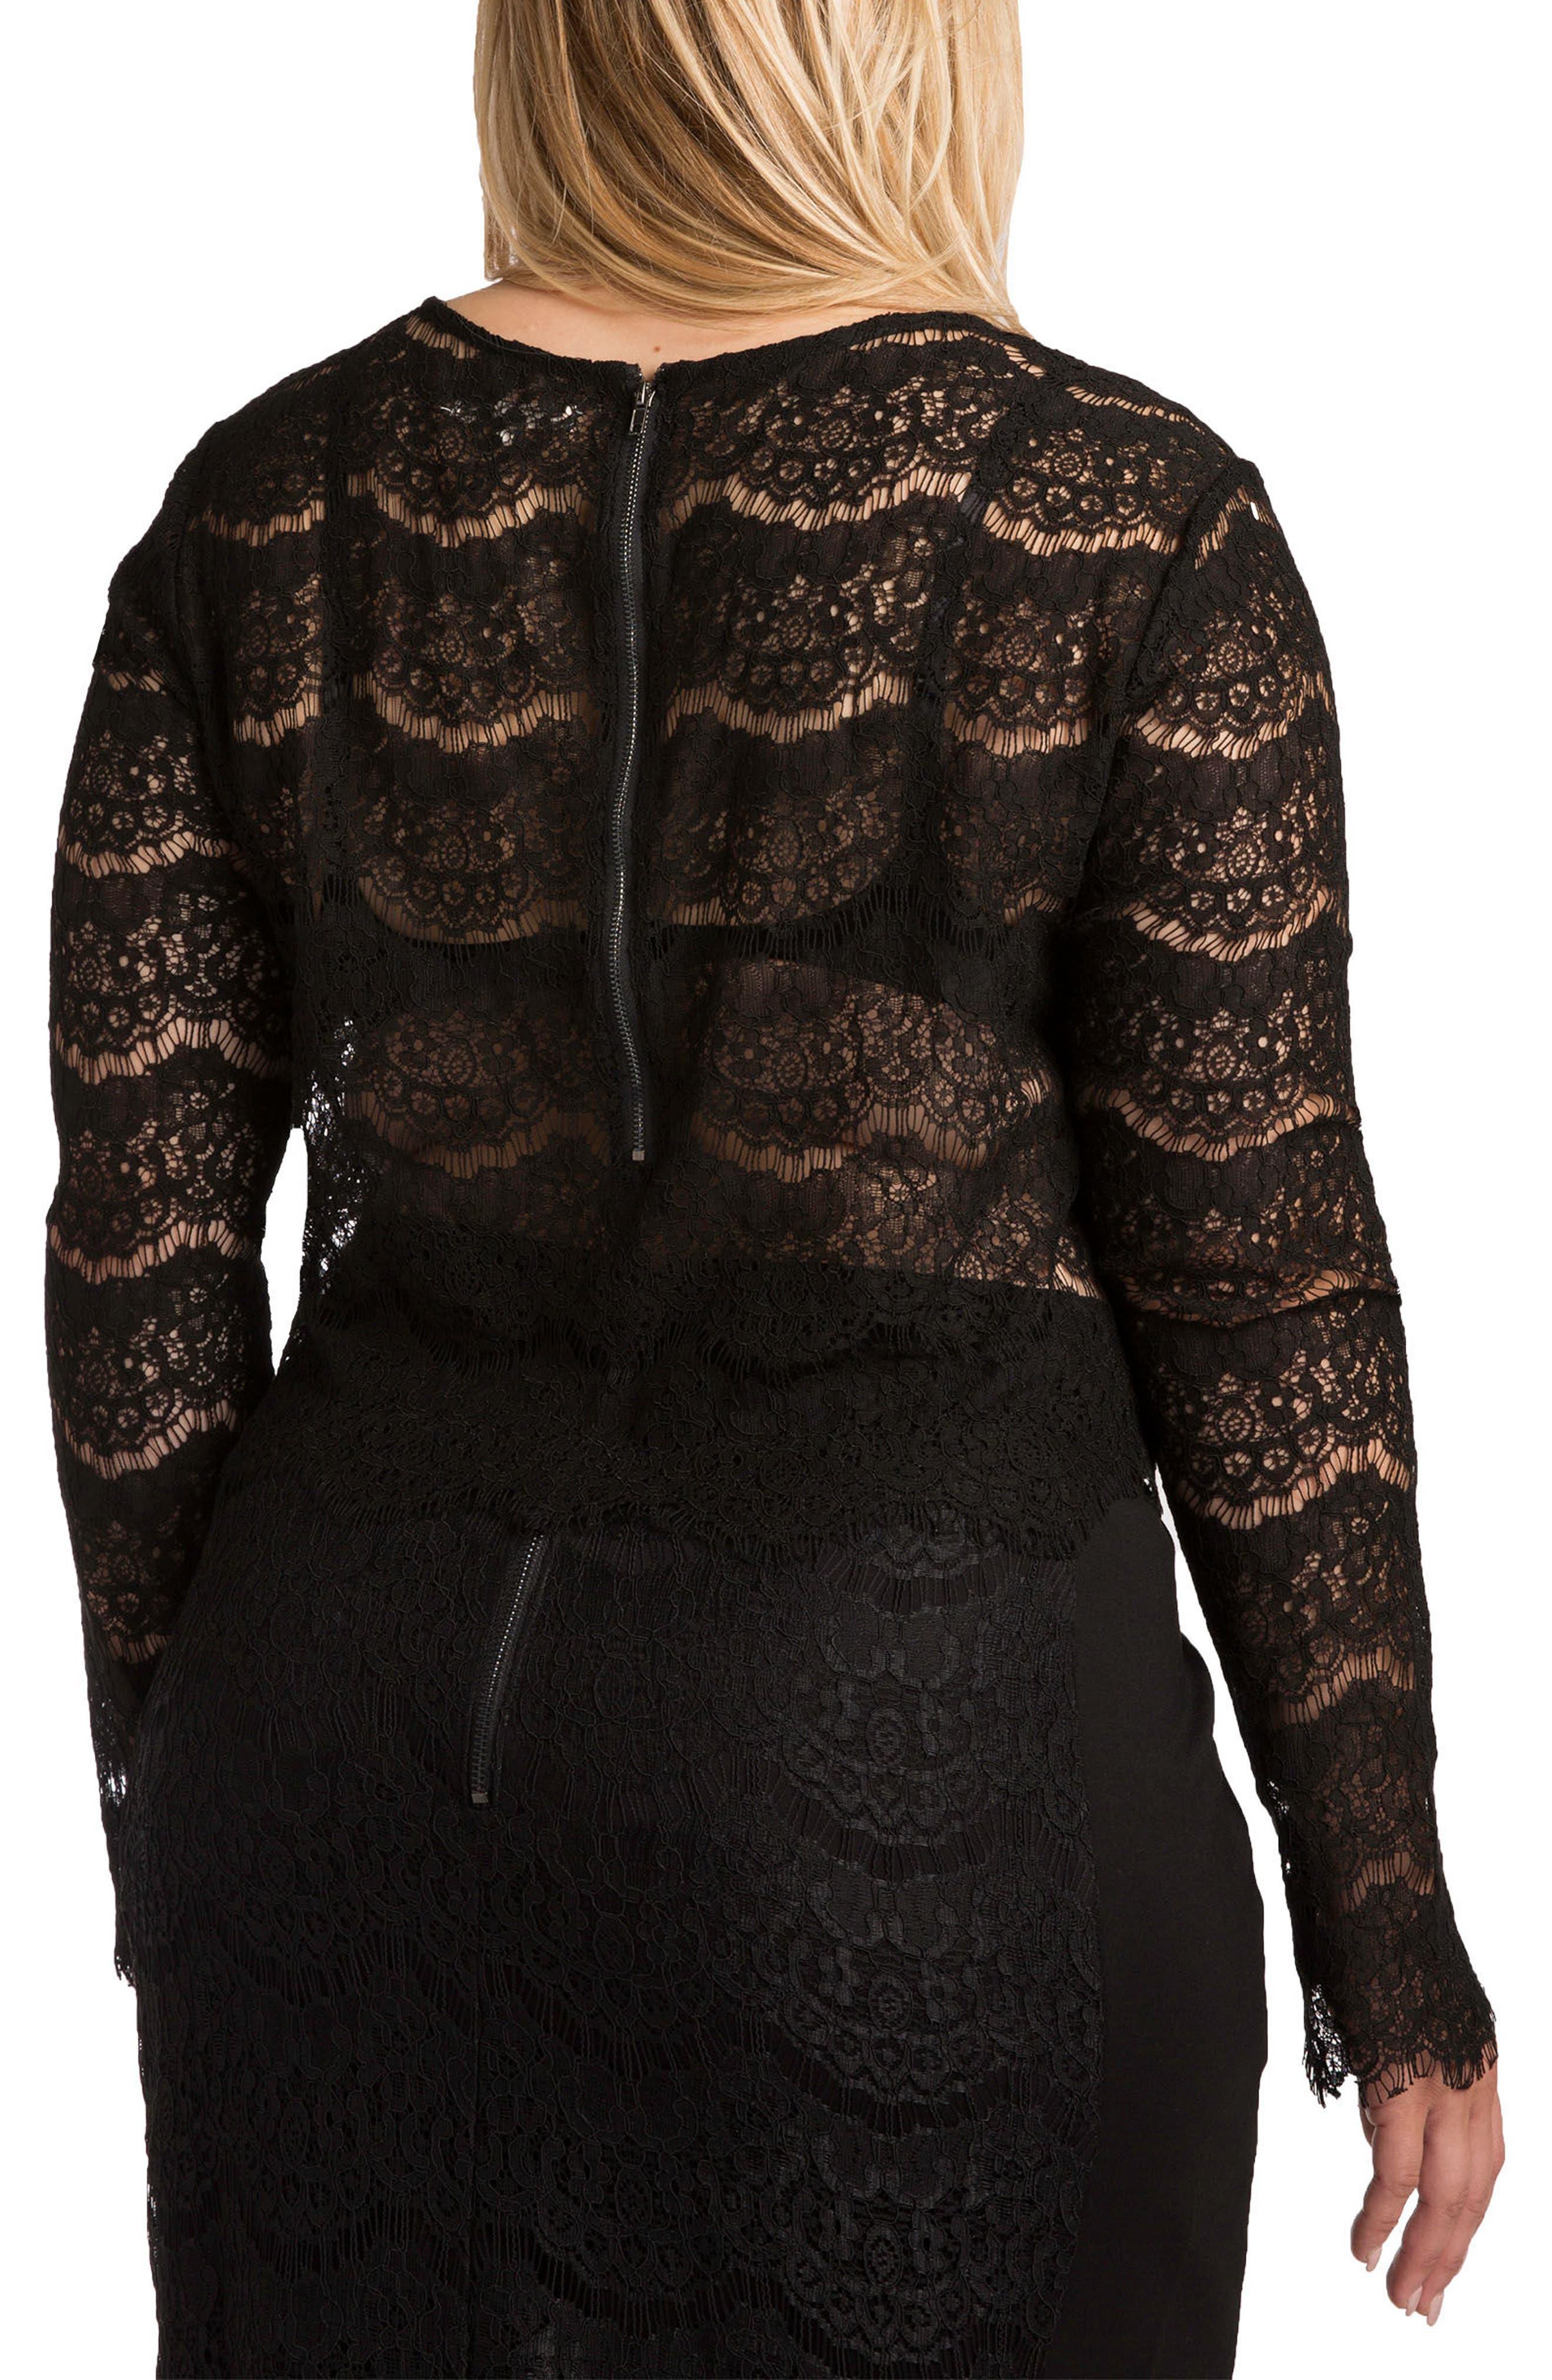 STANDARDS & PRACTICES, Sydney Lace Skimmer Top, Alternate thumbnail 2, color, BLACK